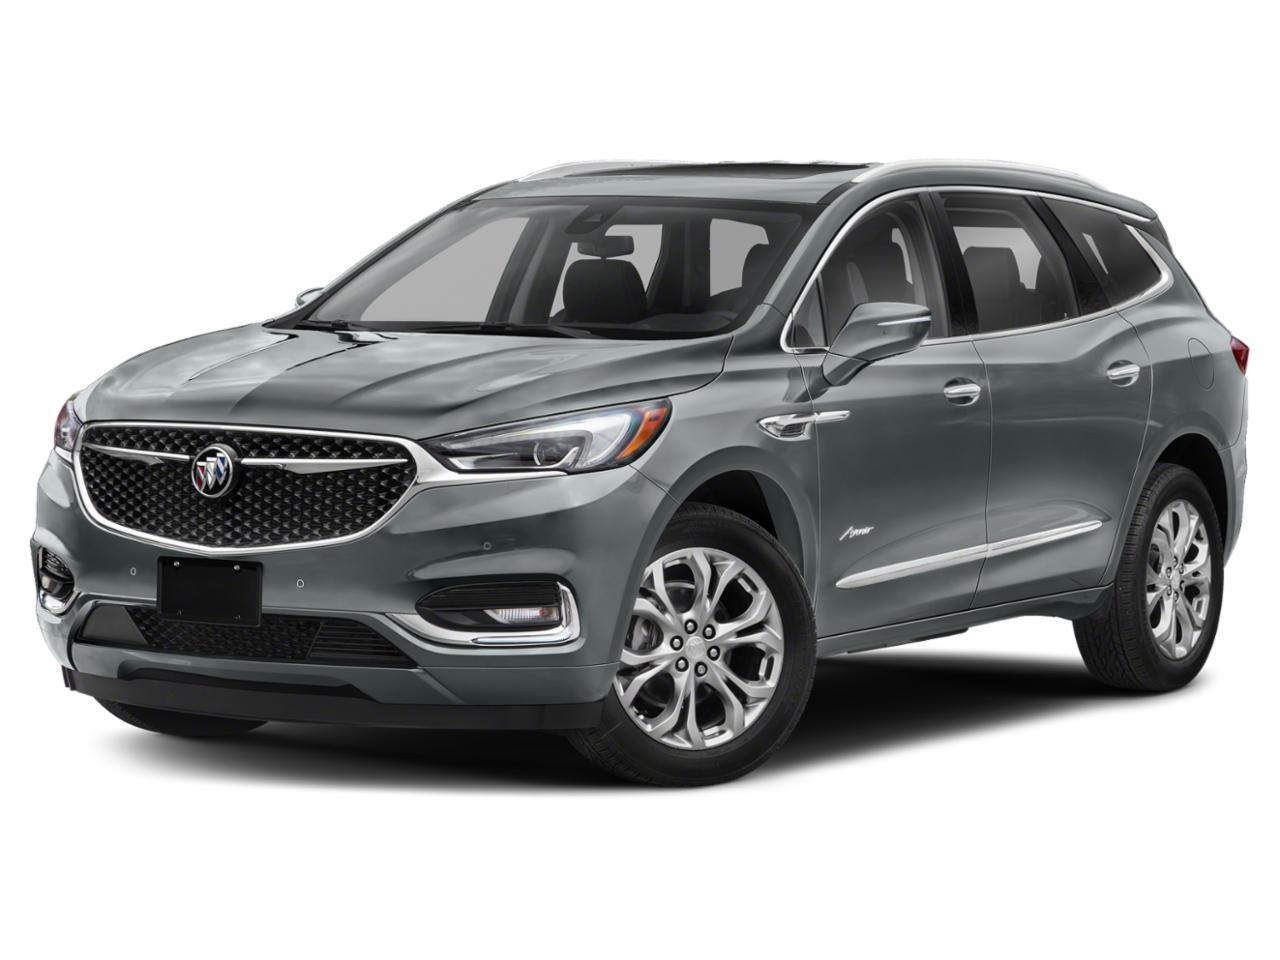 Satin Steel Gray Metallic 2020 Buick Enclave ESSENCE SUV Lexington NC